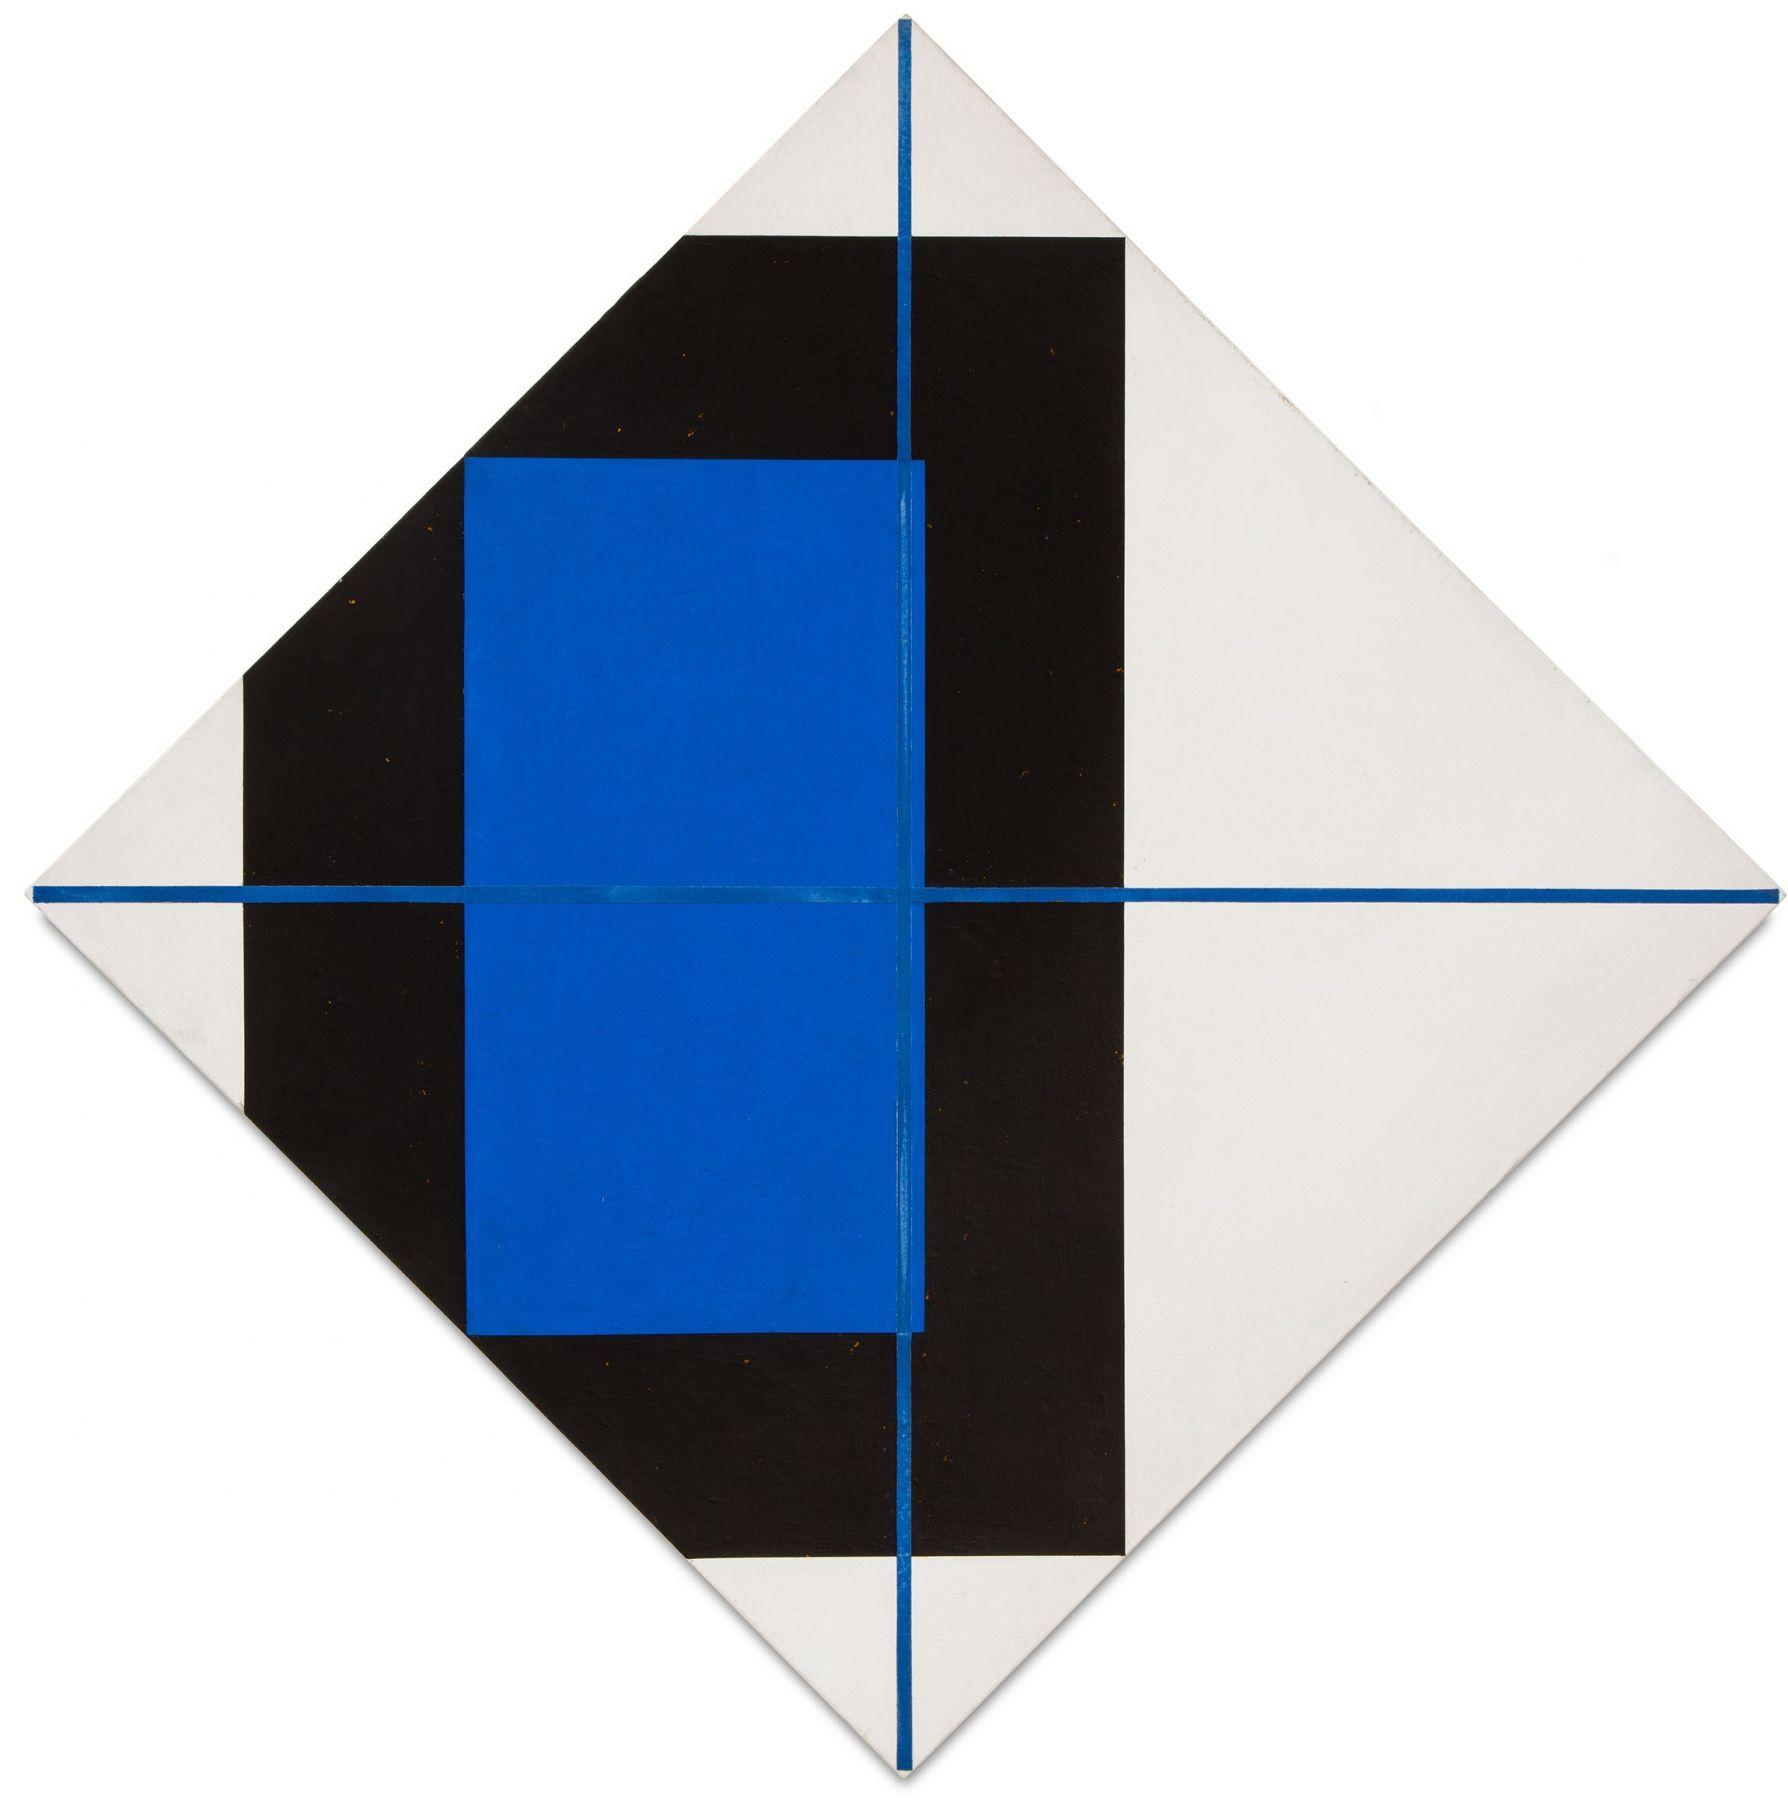 Harvey Quaytman, Hone, 1988, acrylic and ground glass on canvas, 65 x 65 inches (courtesy of Van Doren Waxter)